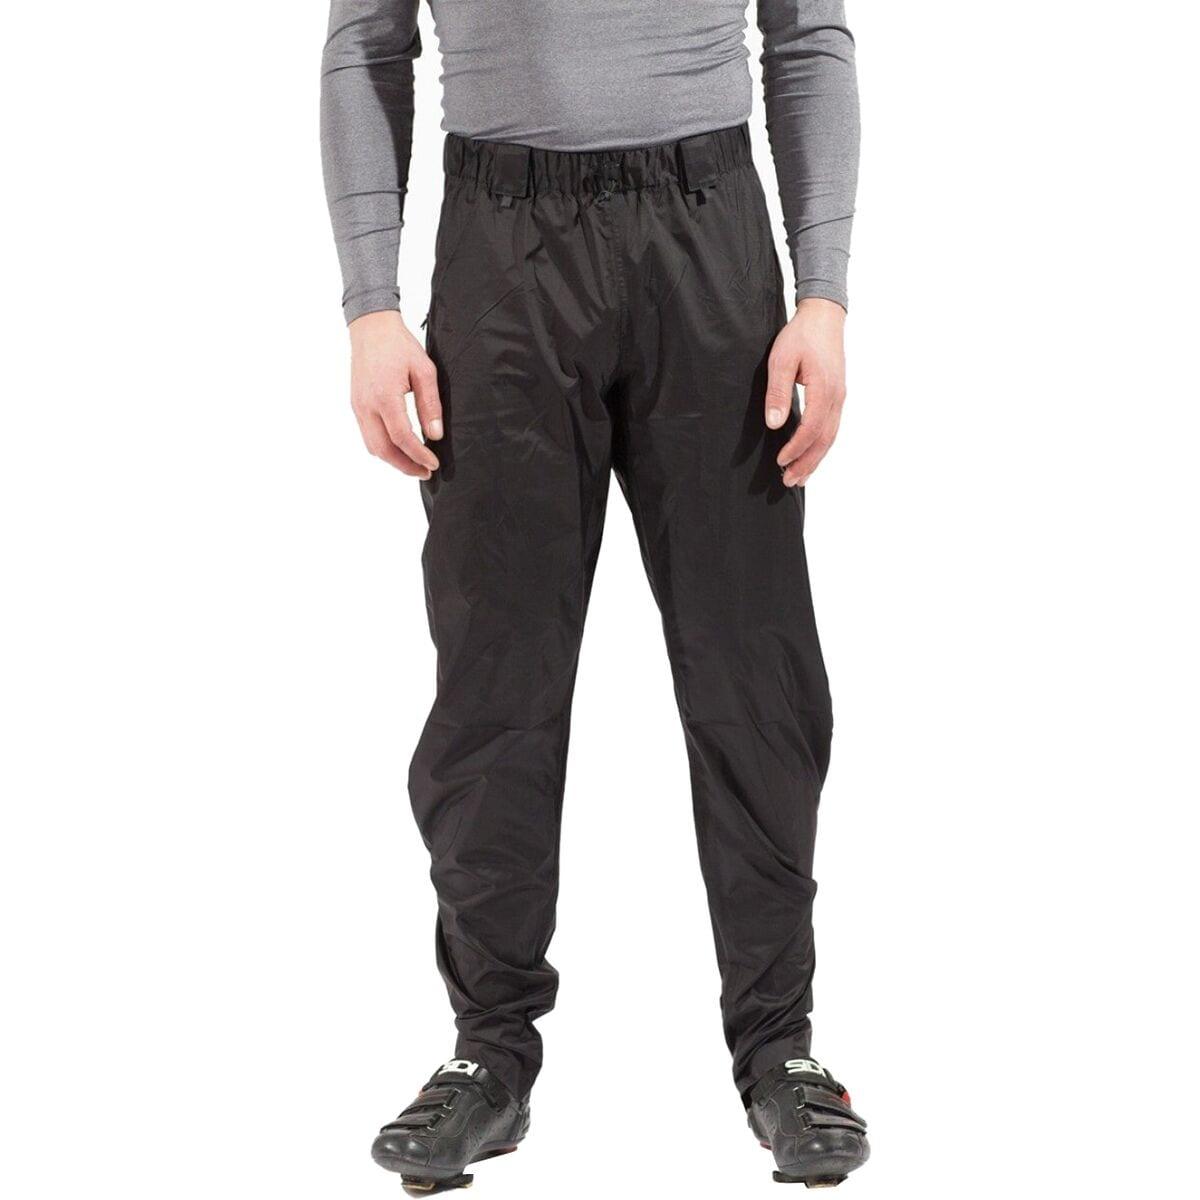 Unisex Showers Pass Lightweight Waterproof Storm Rain Pants